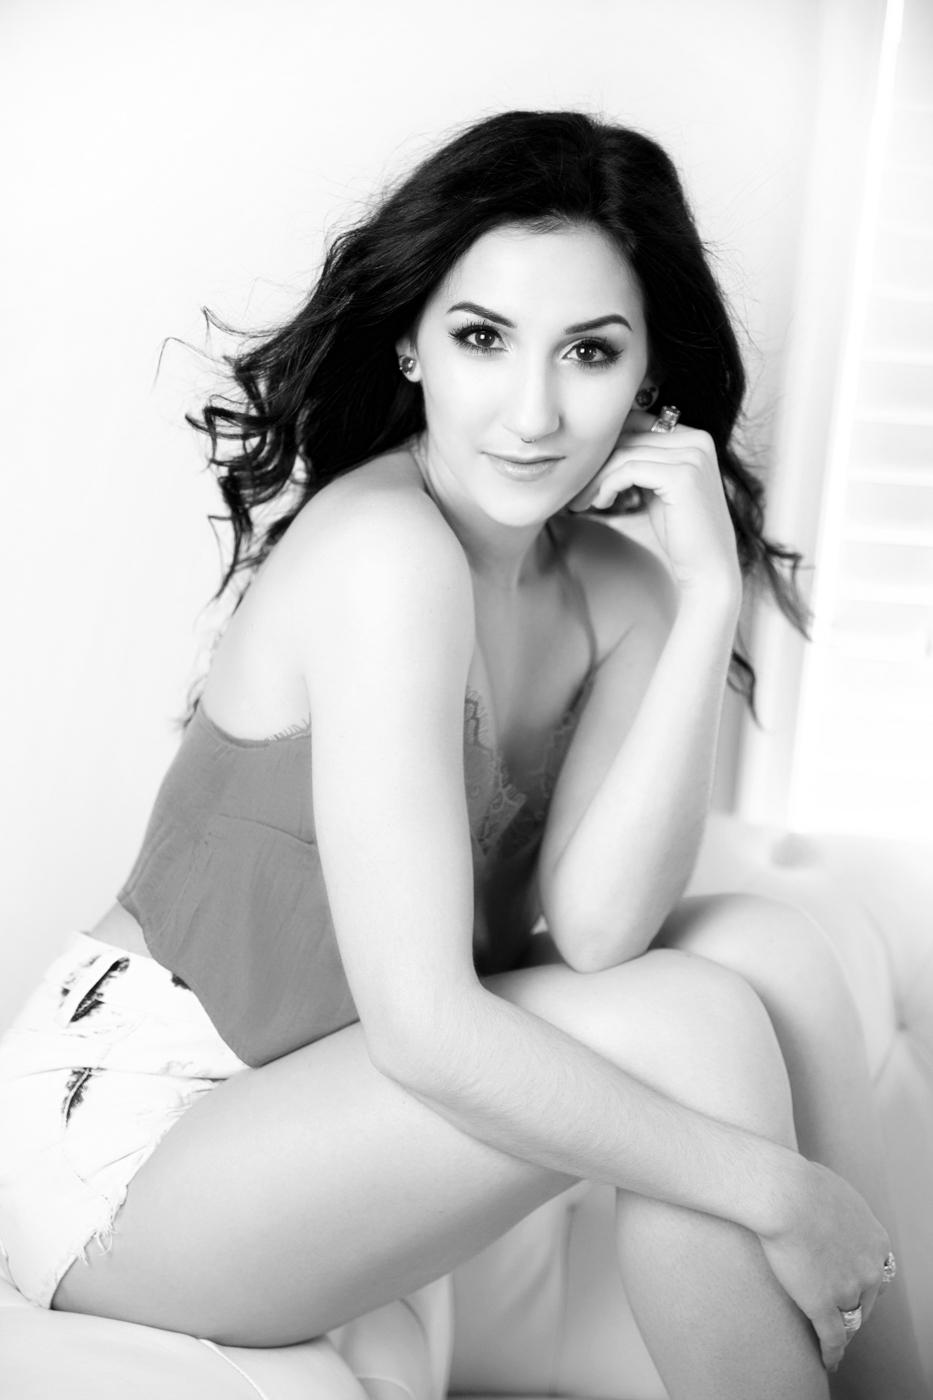 Jessica-Daniel-Engagement-Photo-Shoot-in-the-heart-of-Washington-DC-Ksenia-Pro-Photography-22